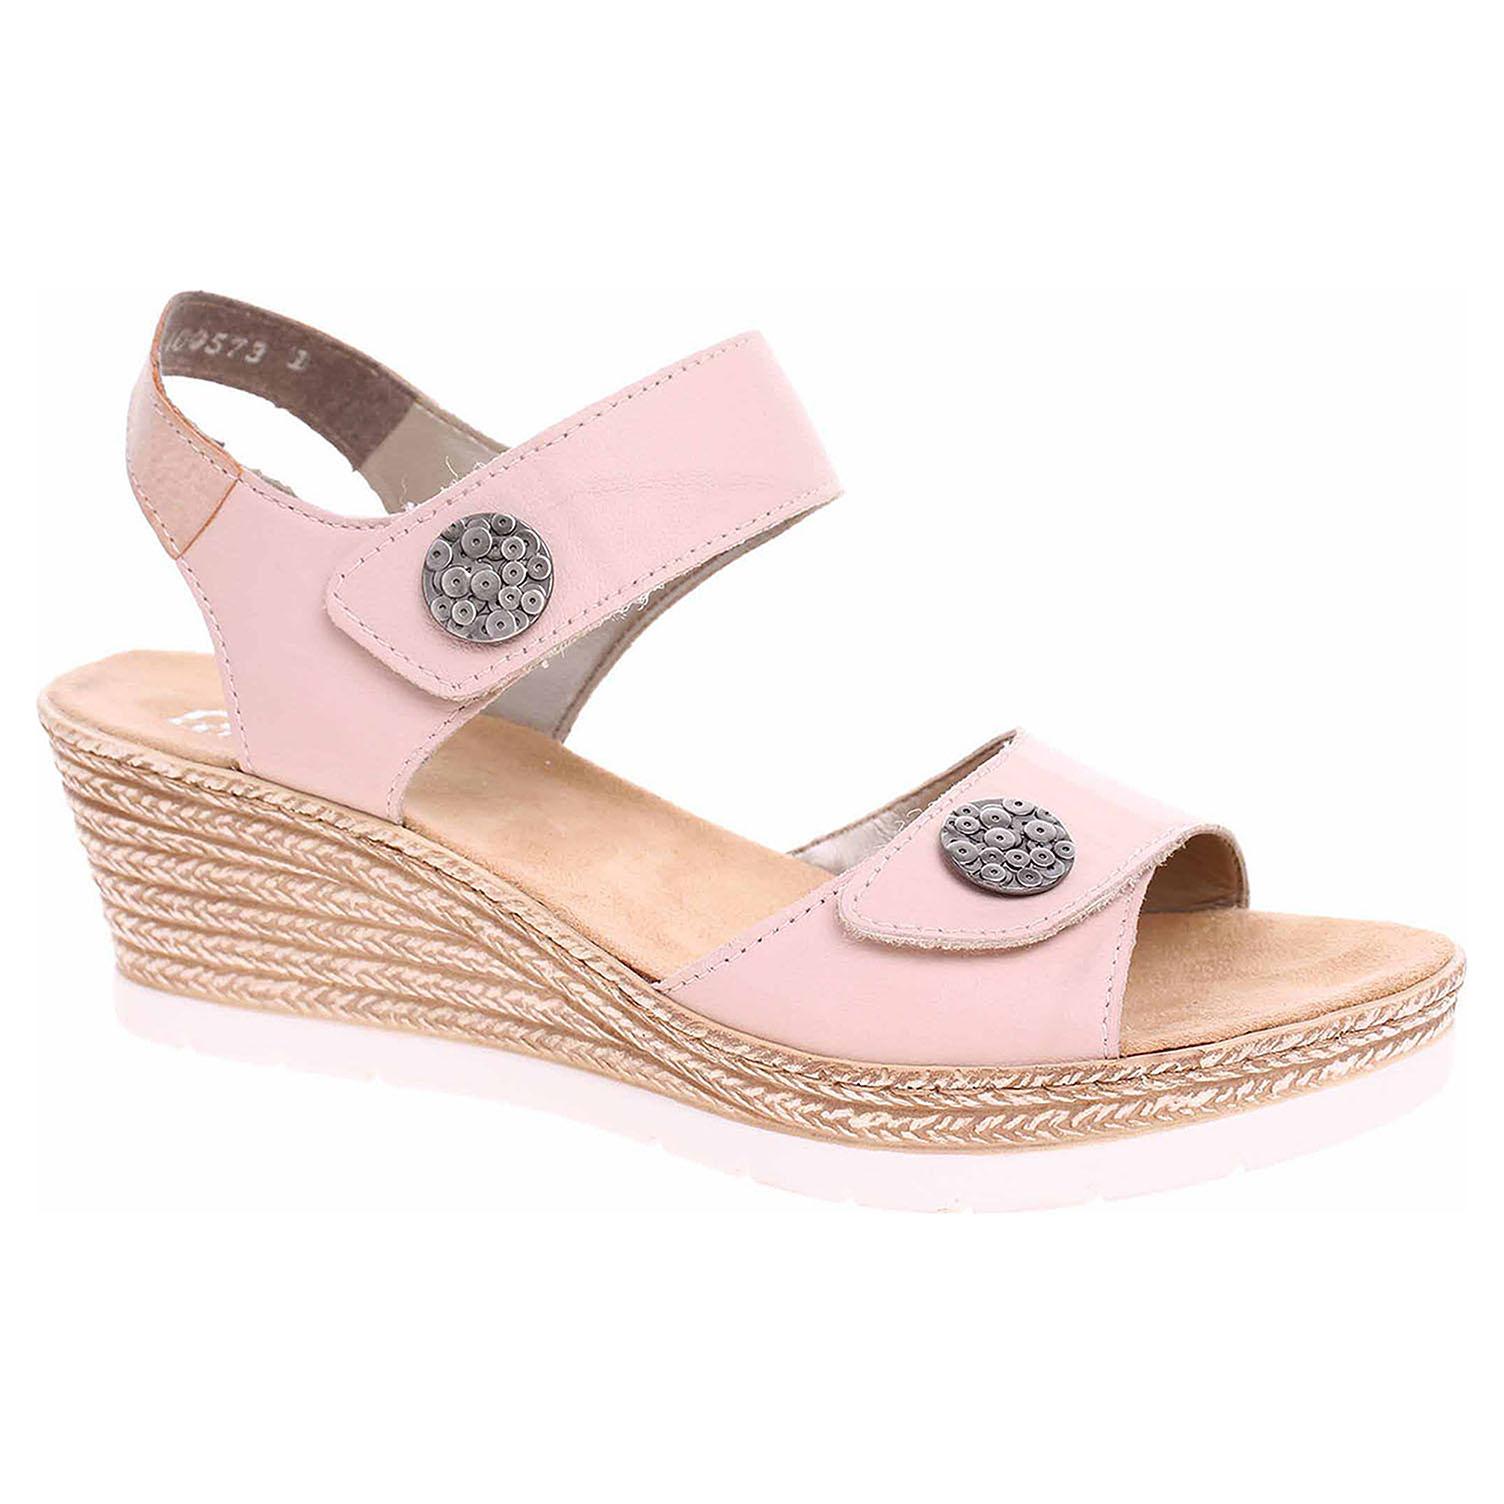 bb6f2790540cc Dámské sandály Rieker 619B9-31 rosa | Rejnok obuv